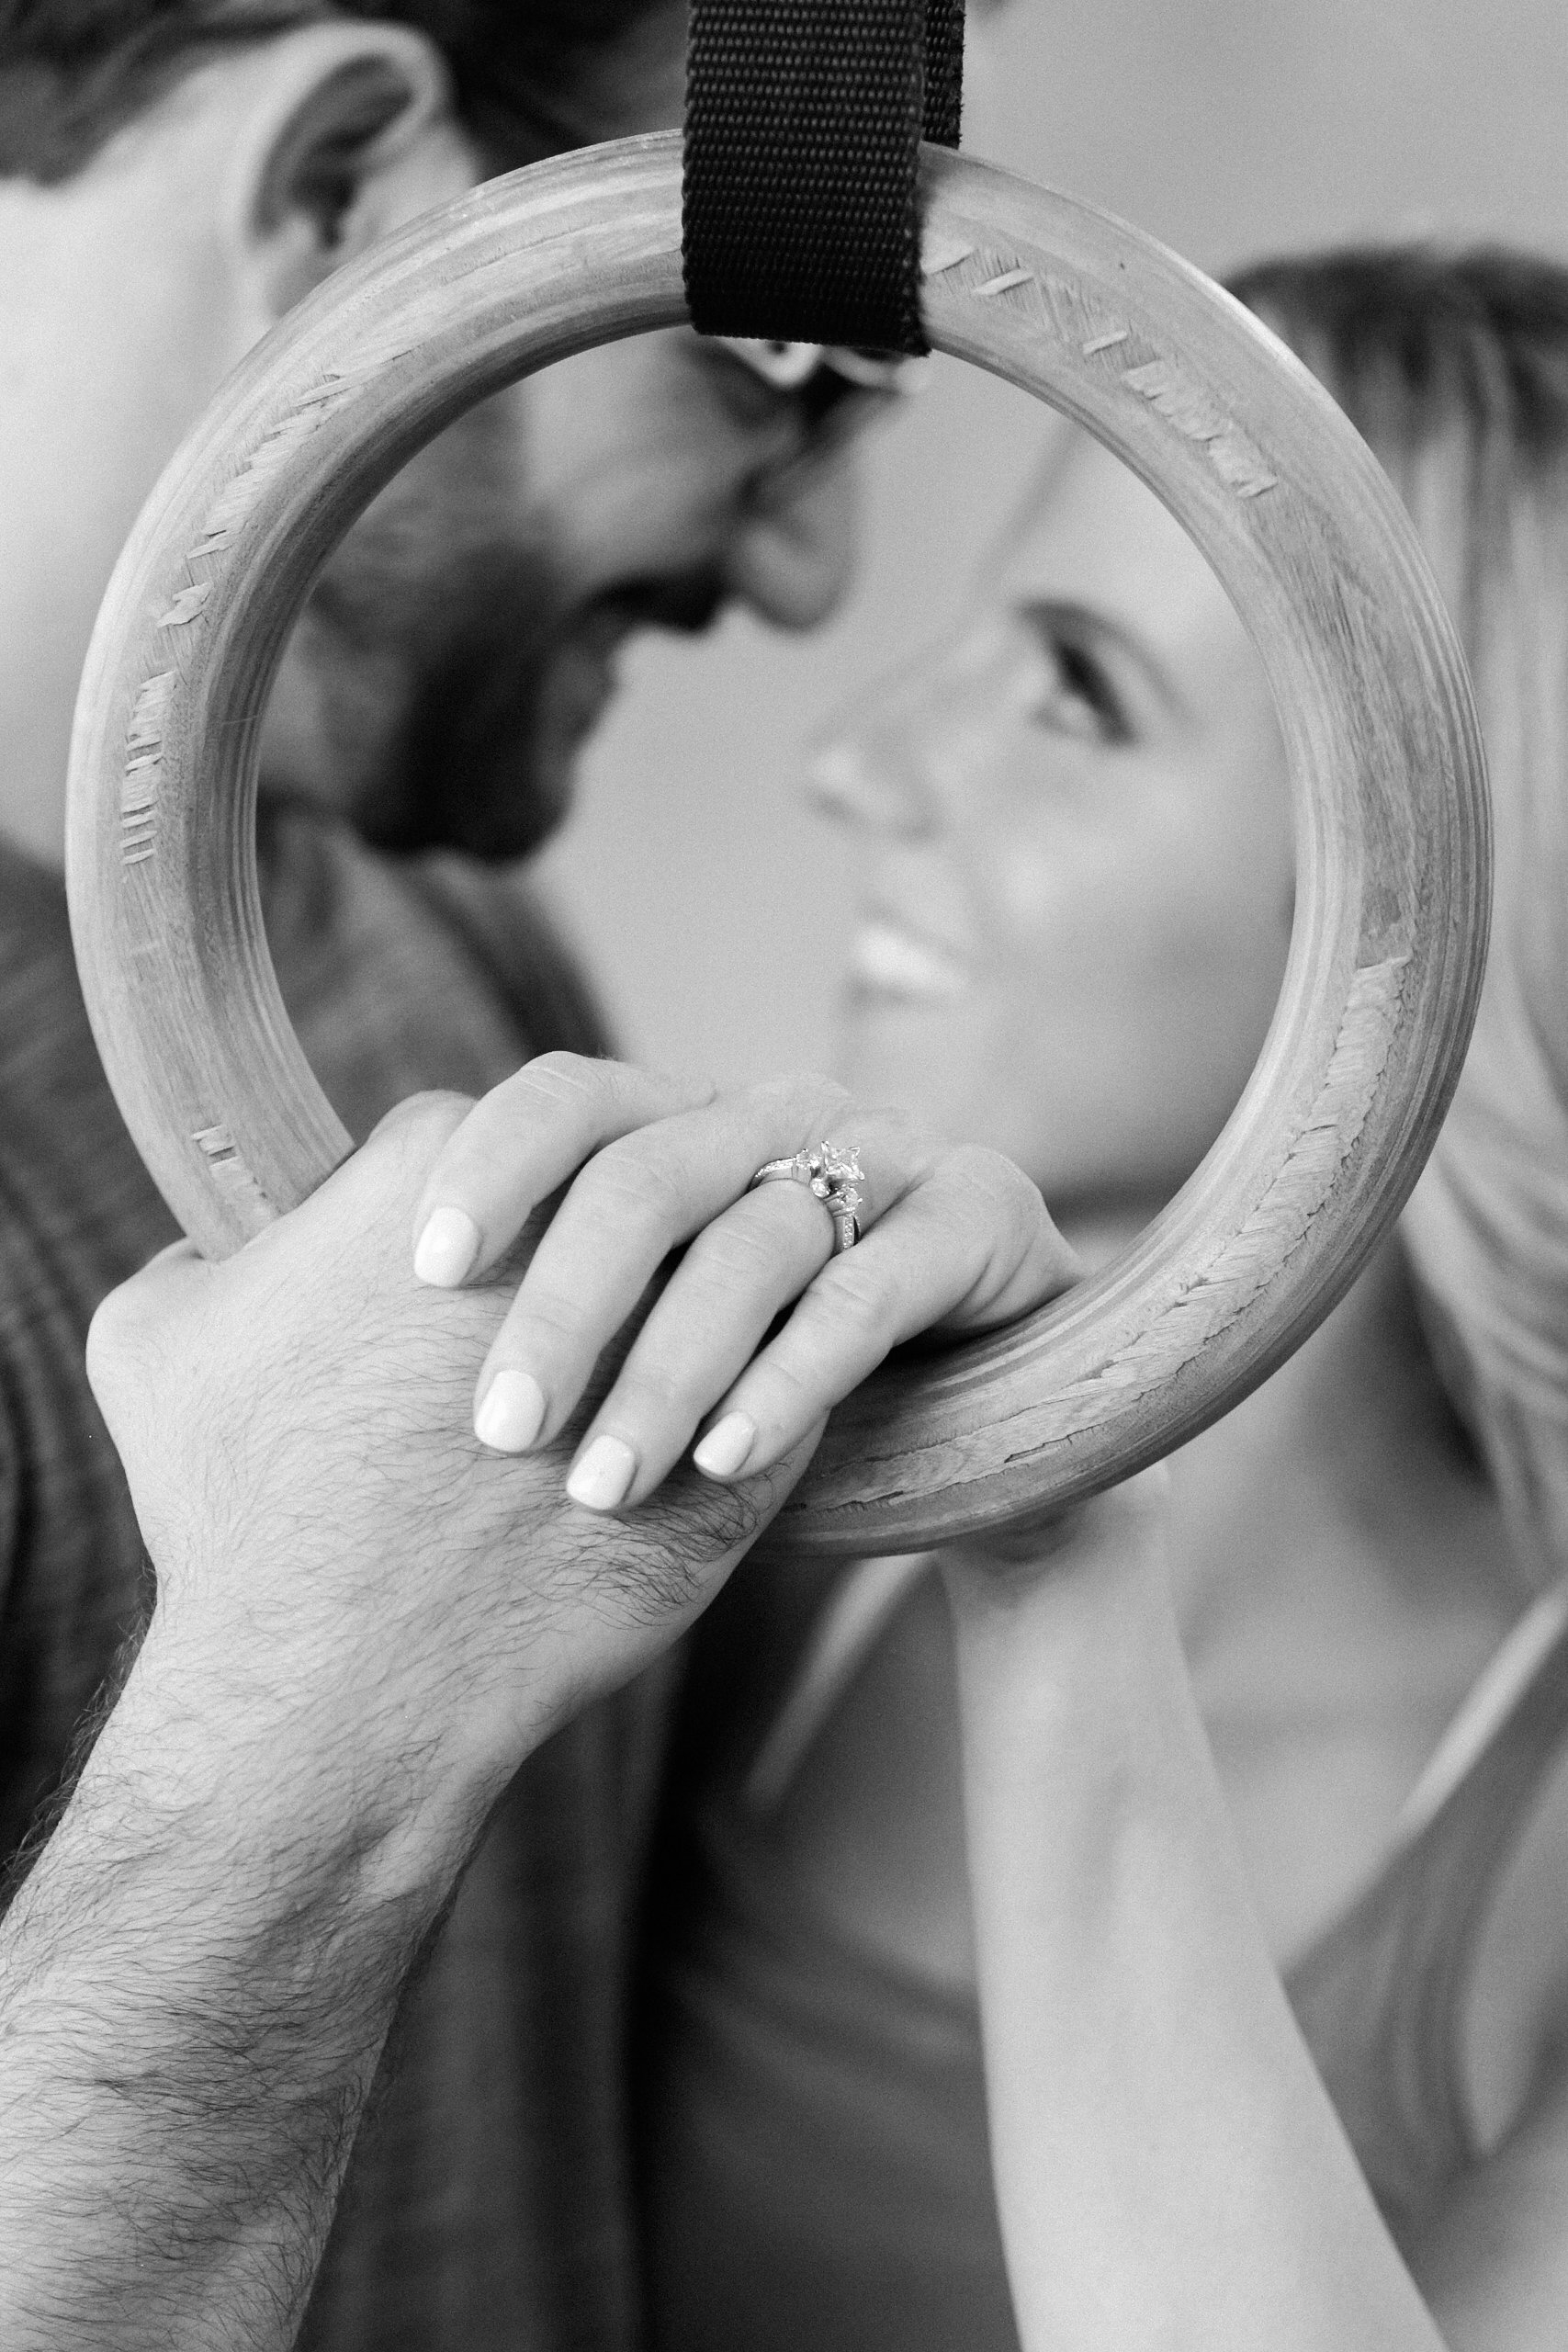 Fitness Crossfit Engagement Photos - The Overwhelmed Bride Wedding Blog